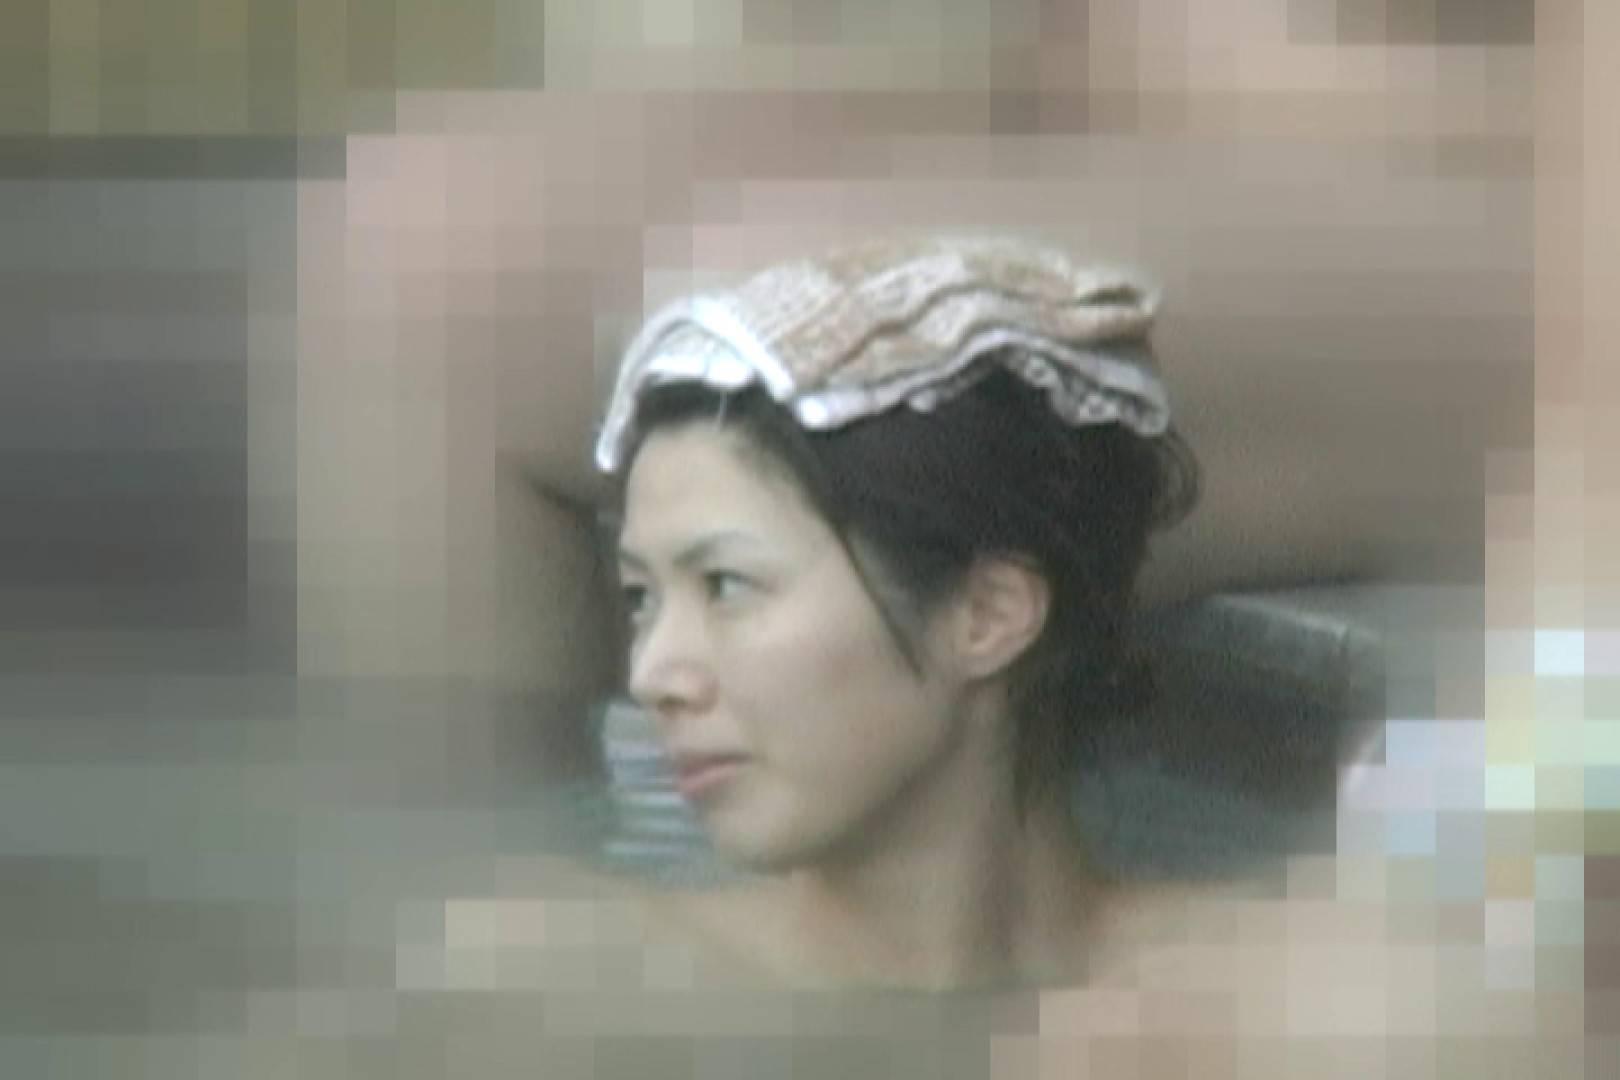 Aquaな露天風呂Vol.856 露天 オマンコ動画キャプチャ 41連発 29